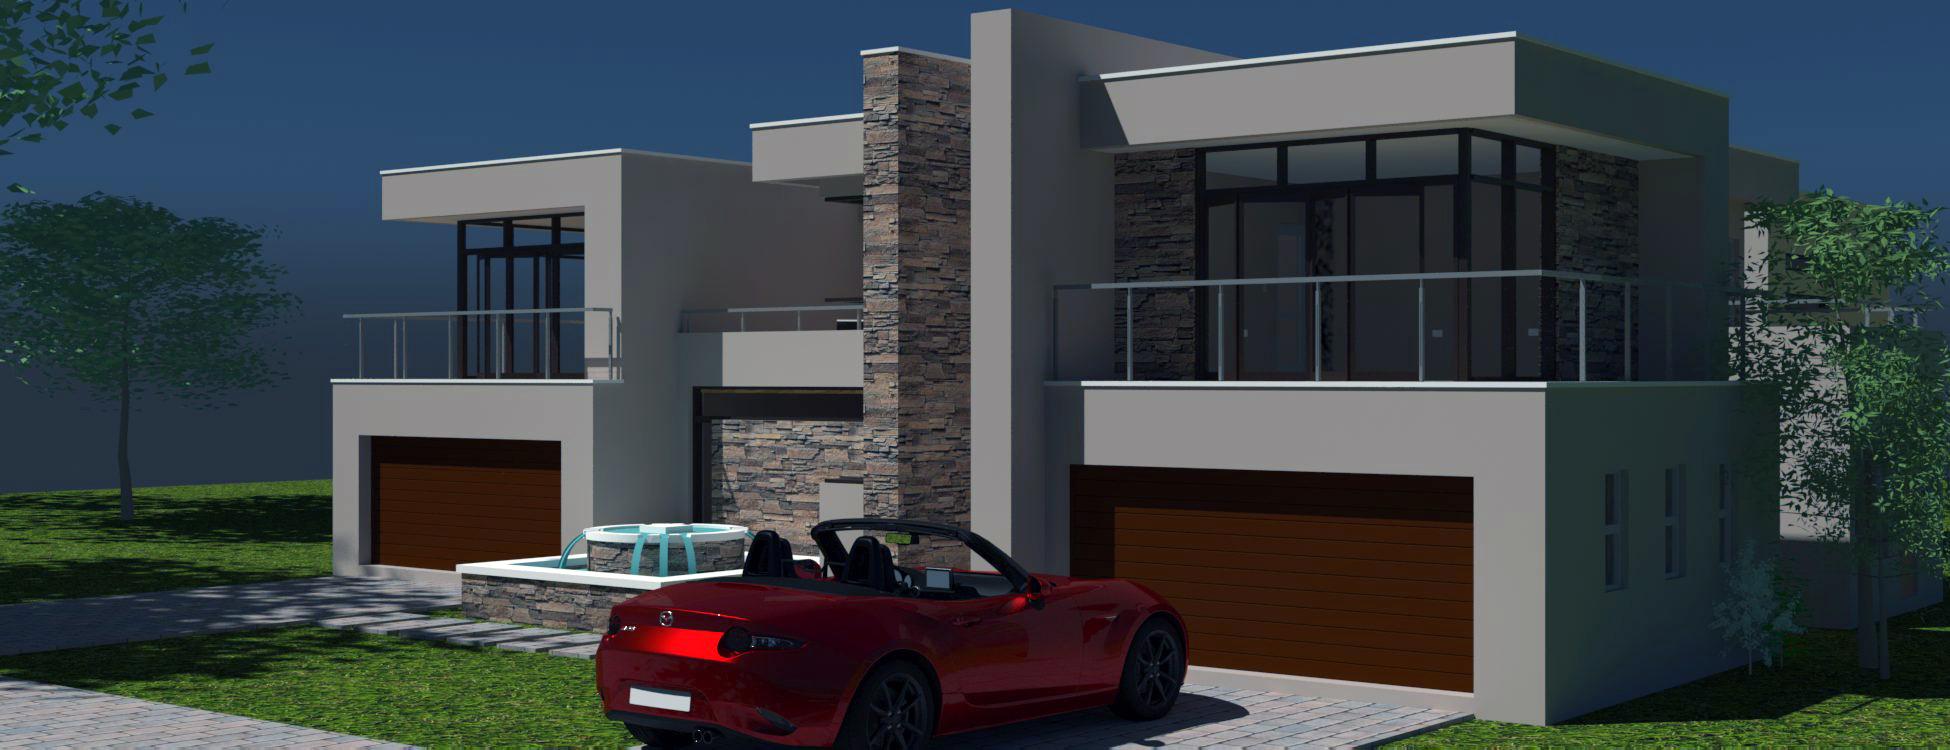 2 Storey House Design | Modern Style 4 Bedroom House ...